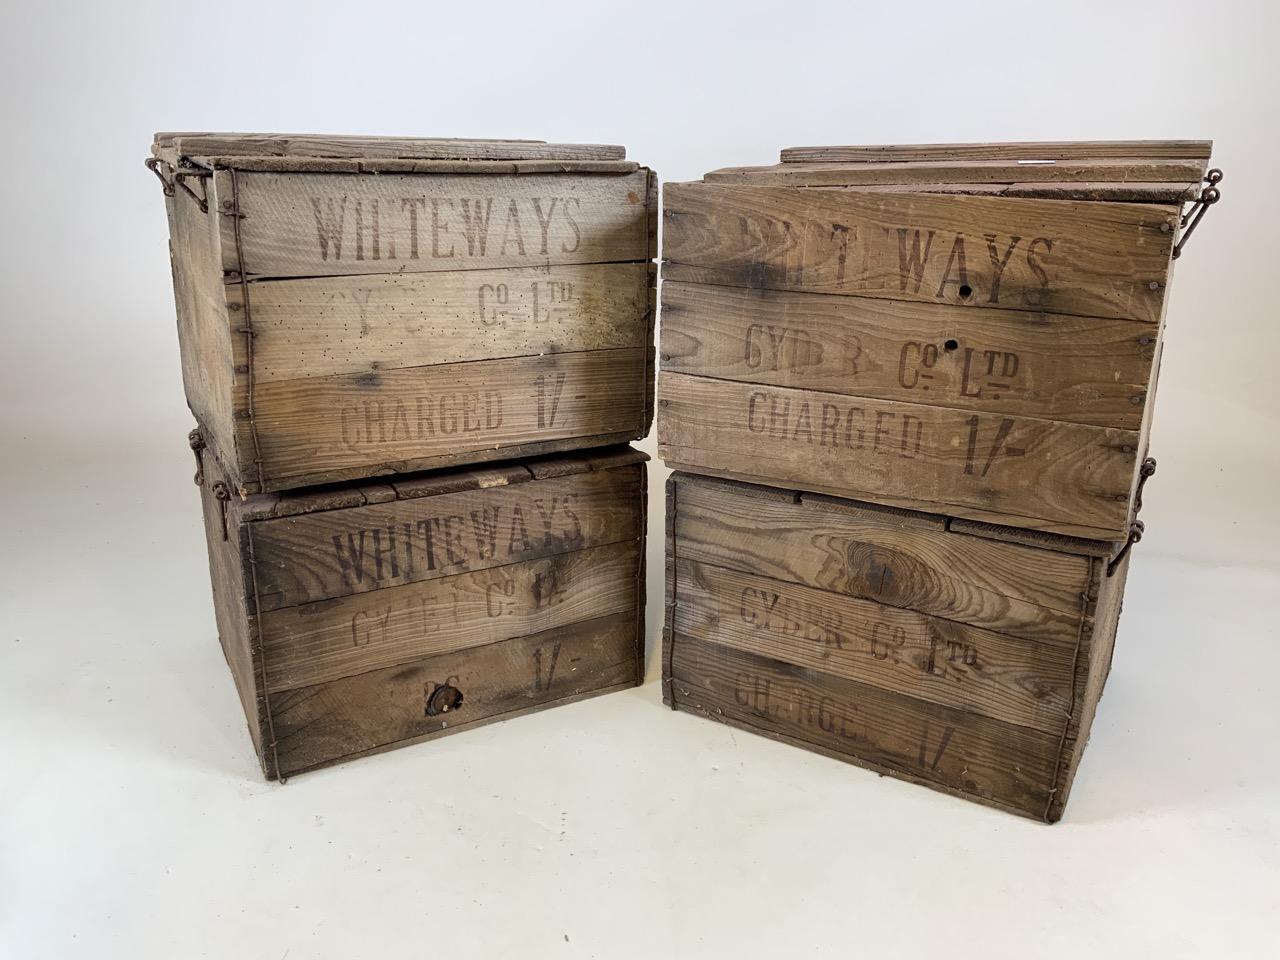 Four Whiteways Cyder Co ltd Cider boxes. From Whiteways, Hele, Exeter. W:32cm x D:39cm x H:28cm